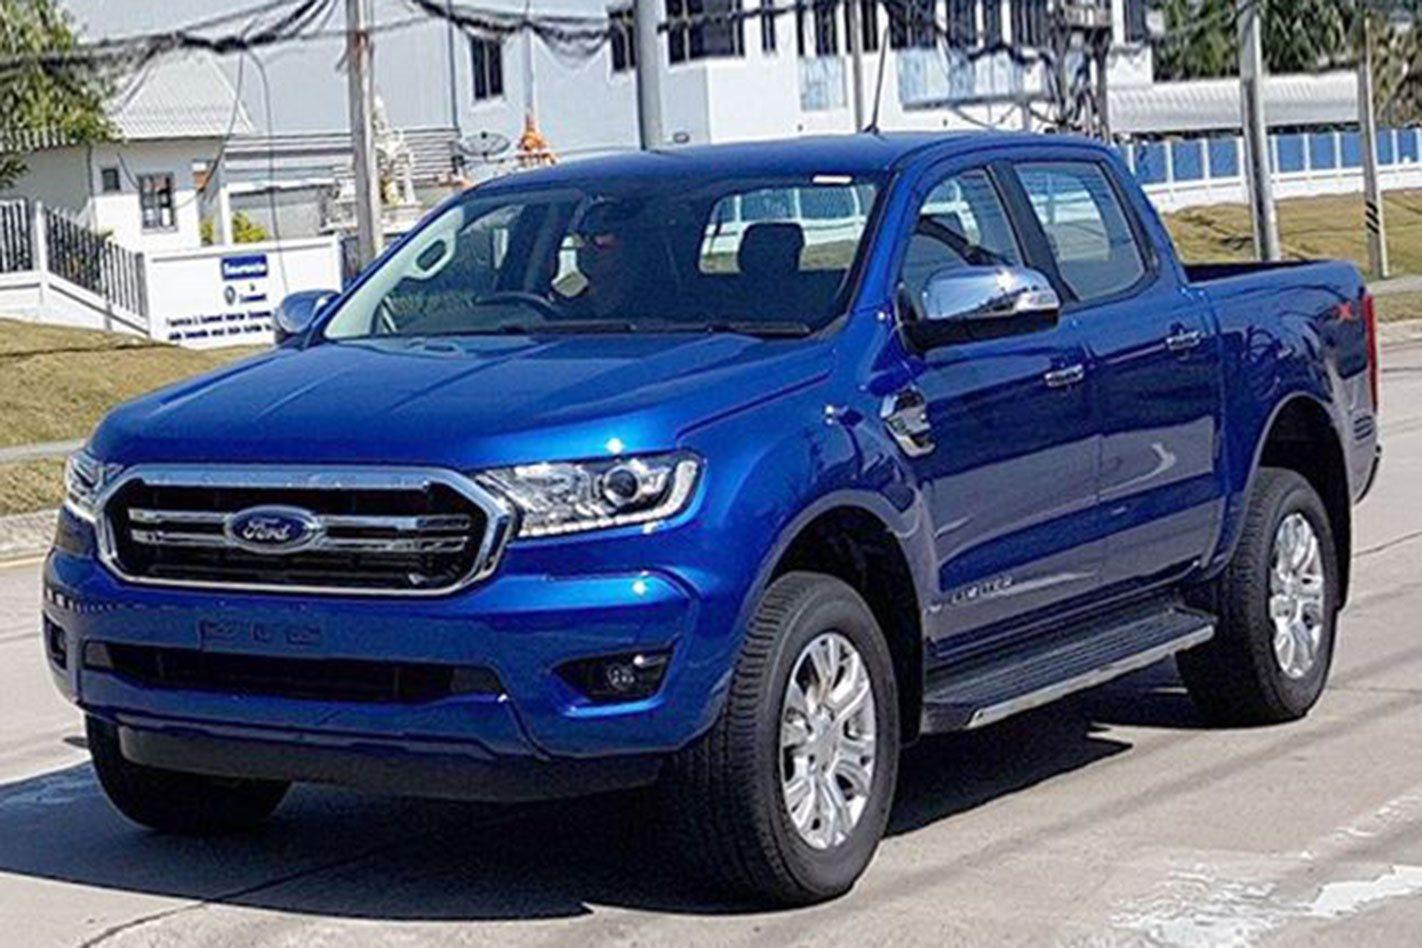 2018 Ford Ranger Facelift Spied